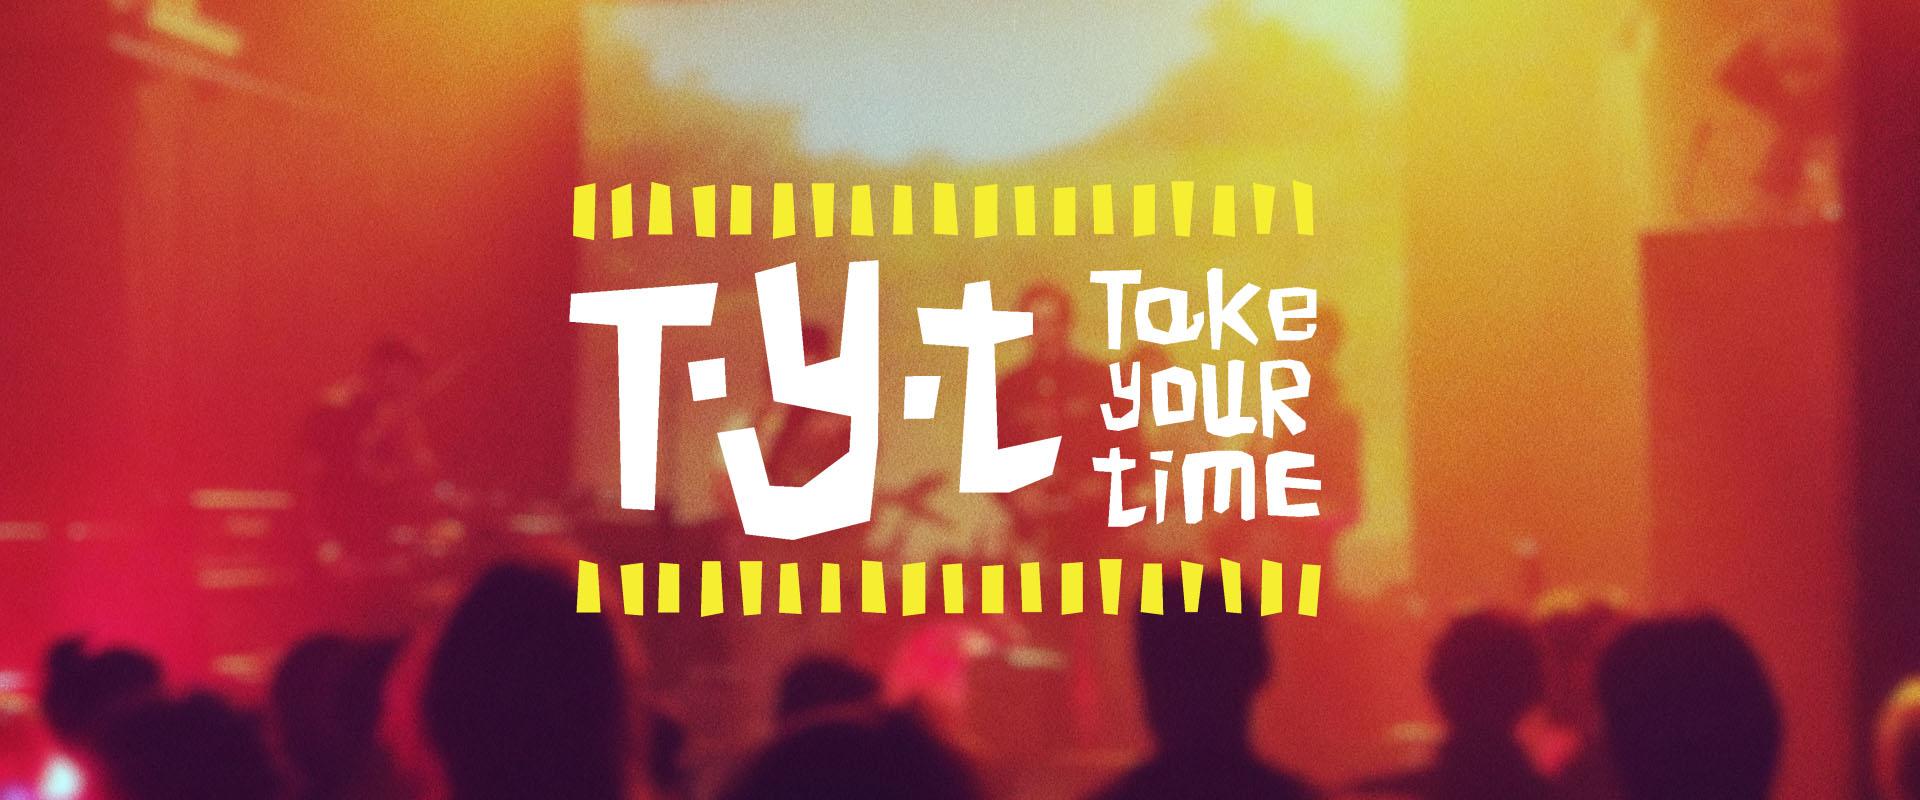 take your time vj club night thumbnail